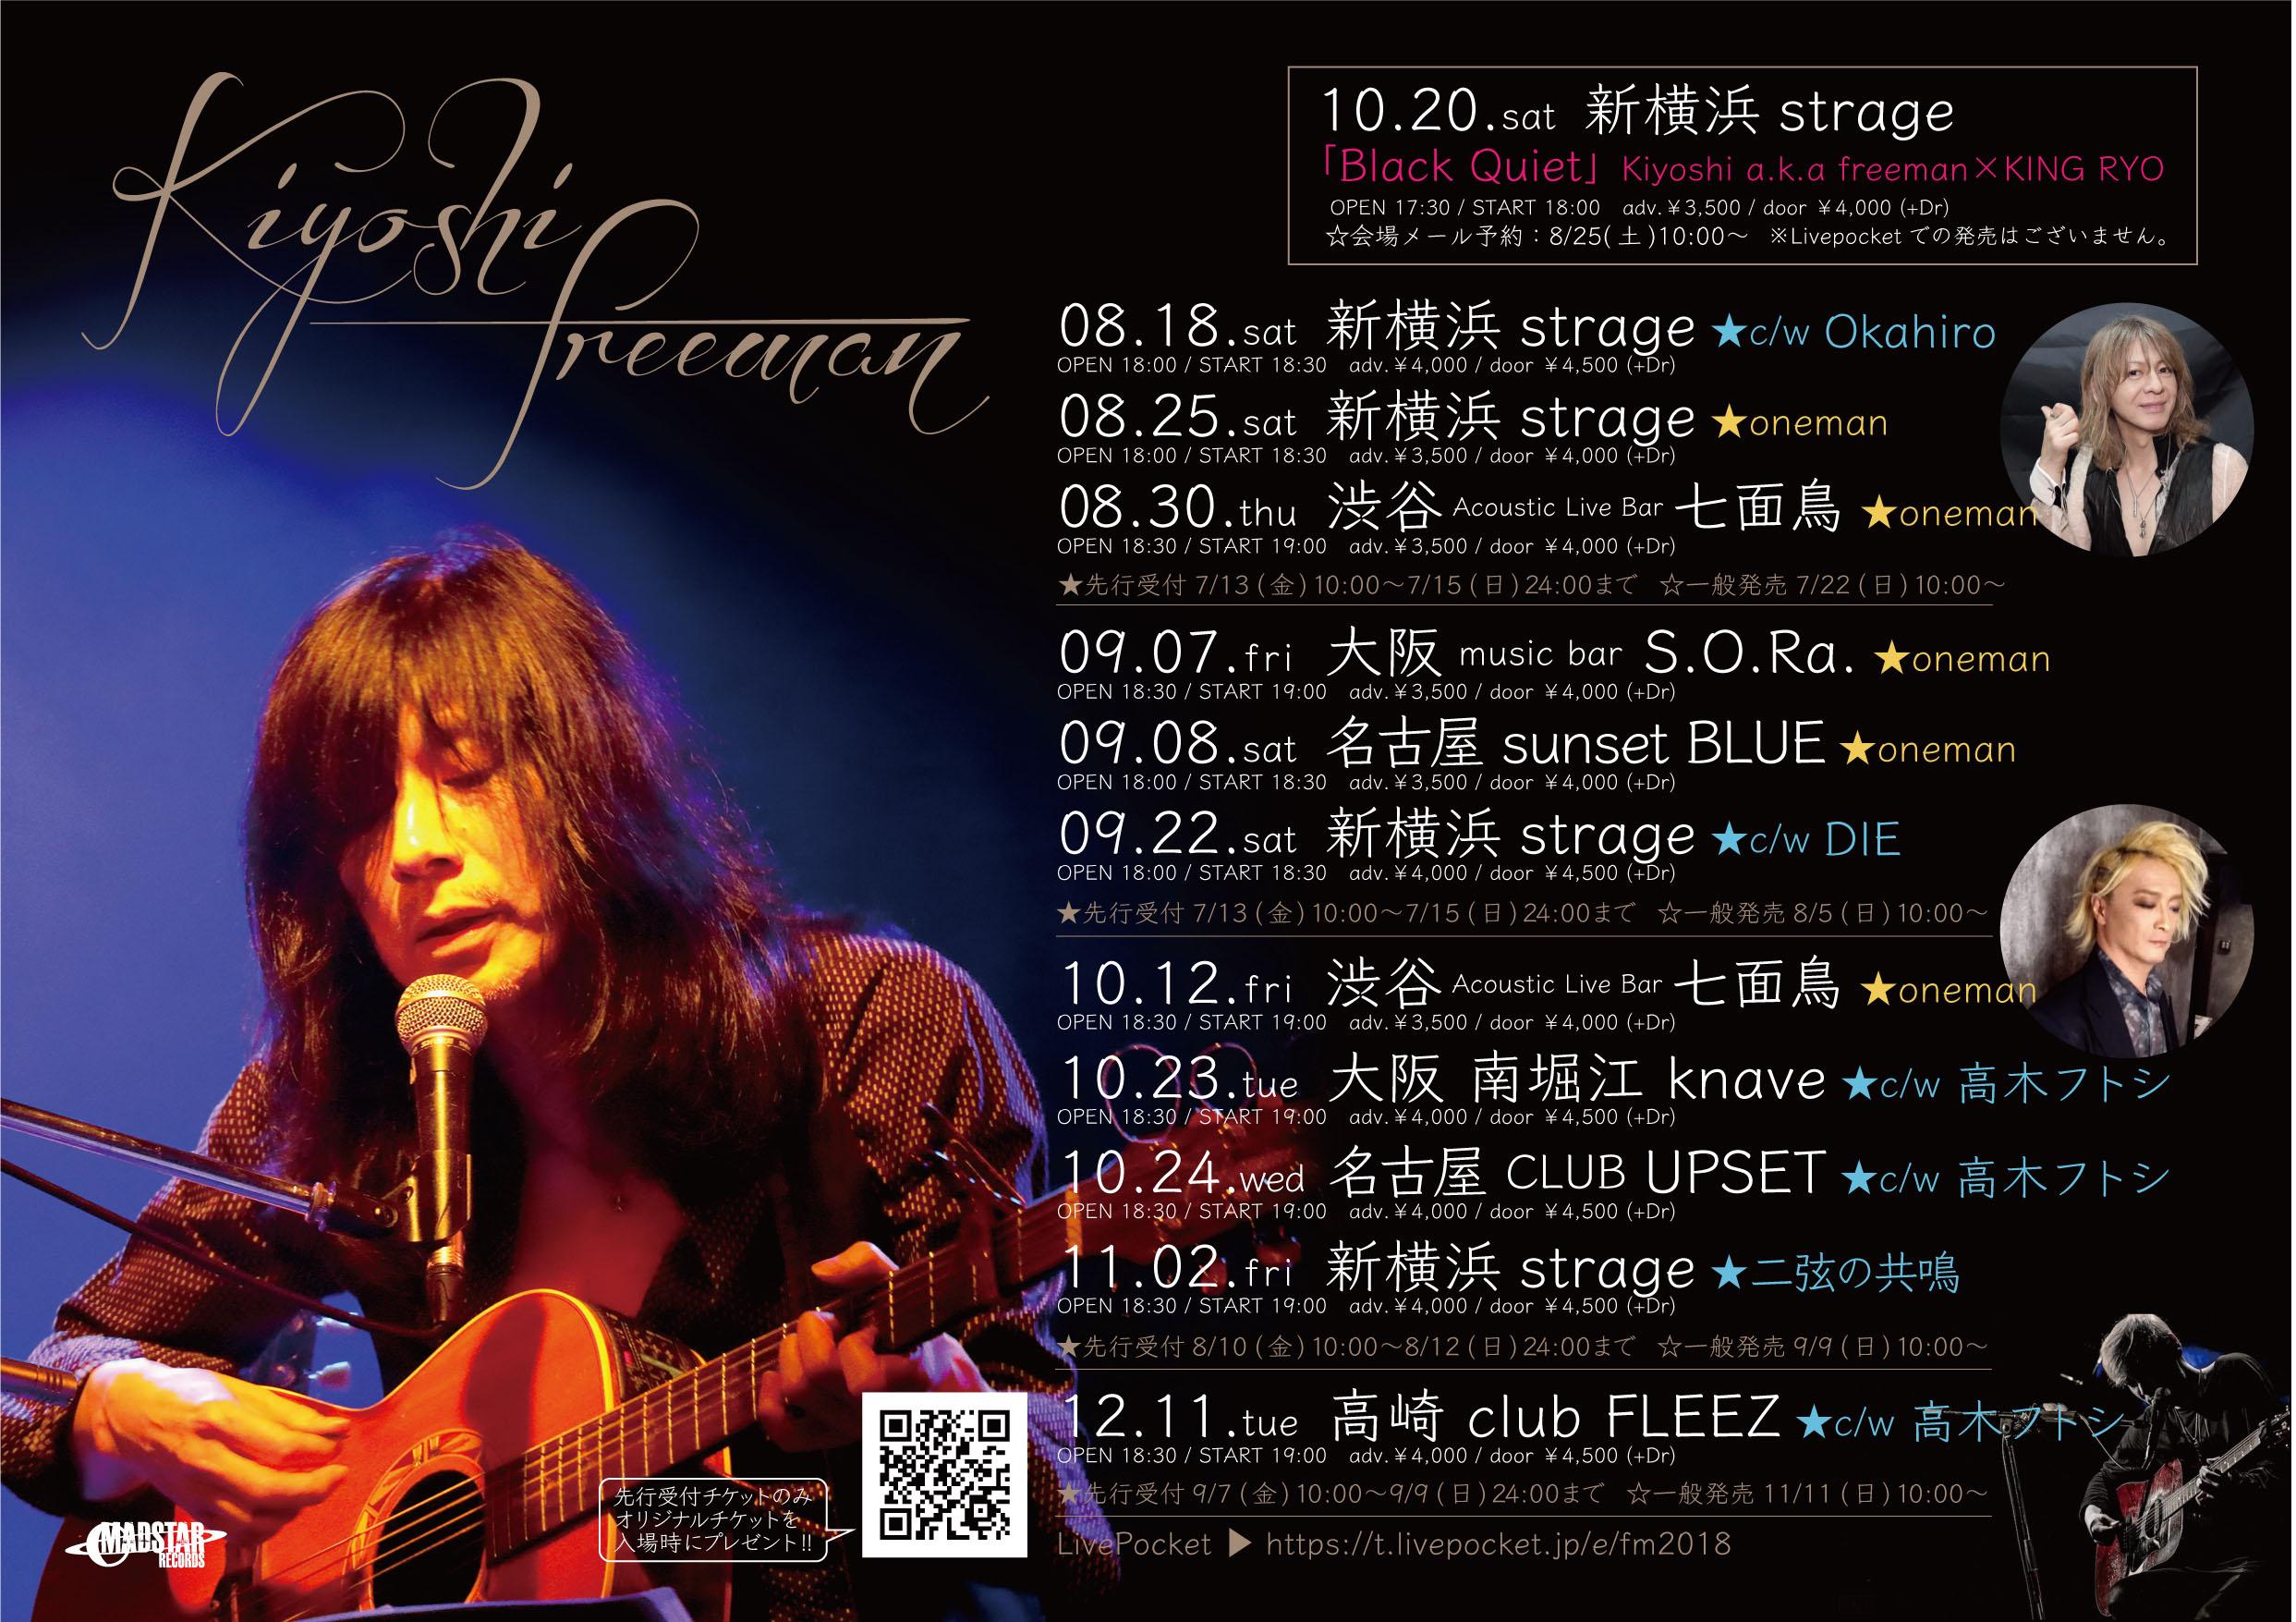 Kiyoshi a.k.a freeman 10/12 渋谷 七面鳥 チケット